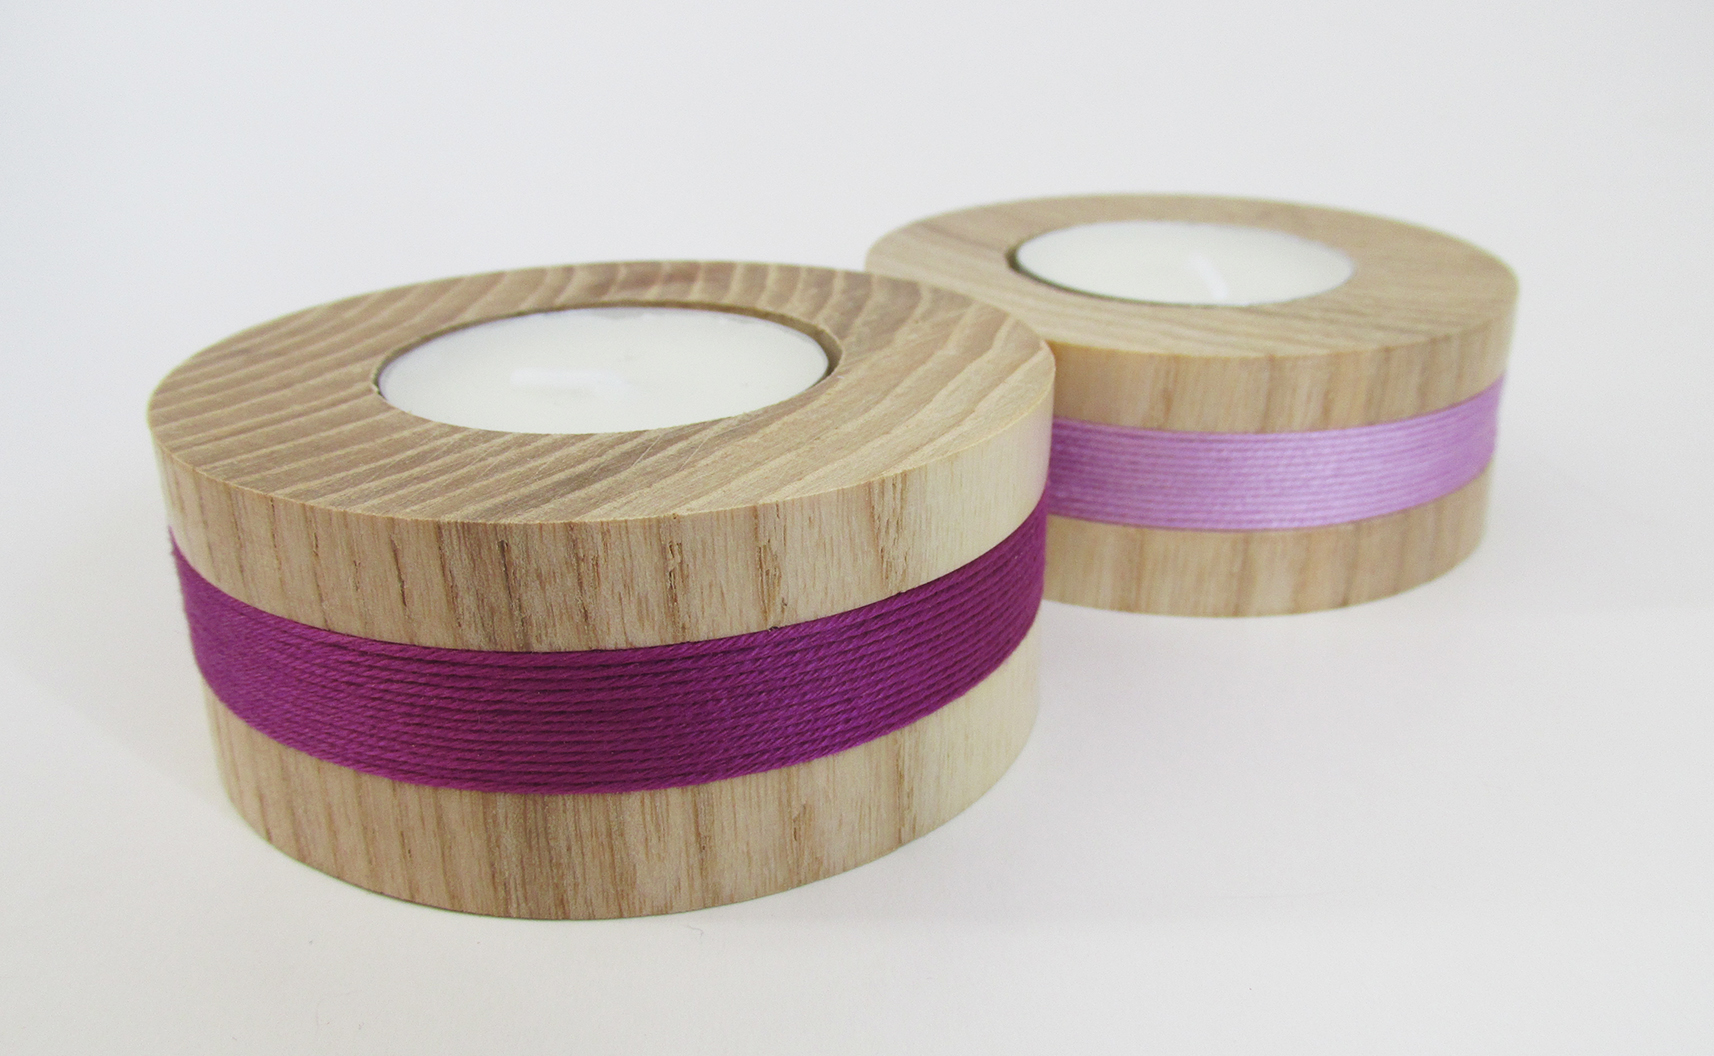 hand made wood turned tealight holders